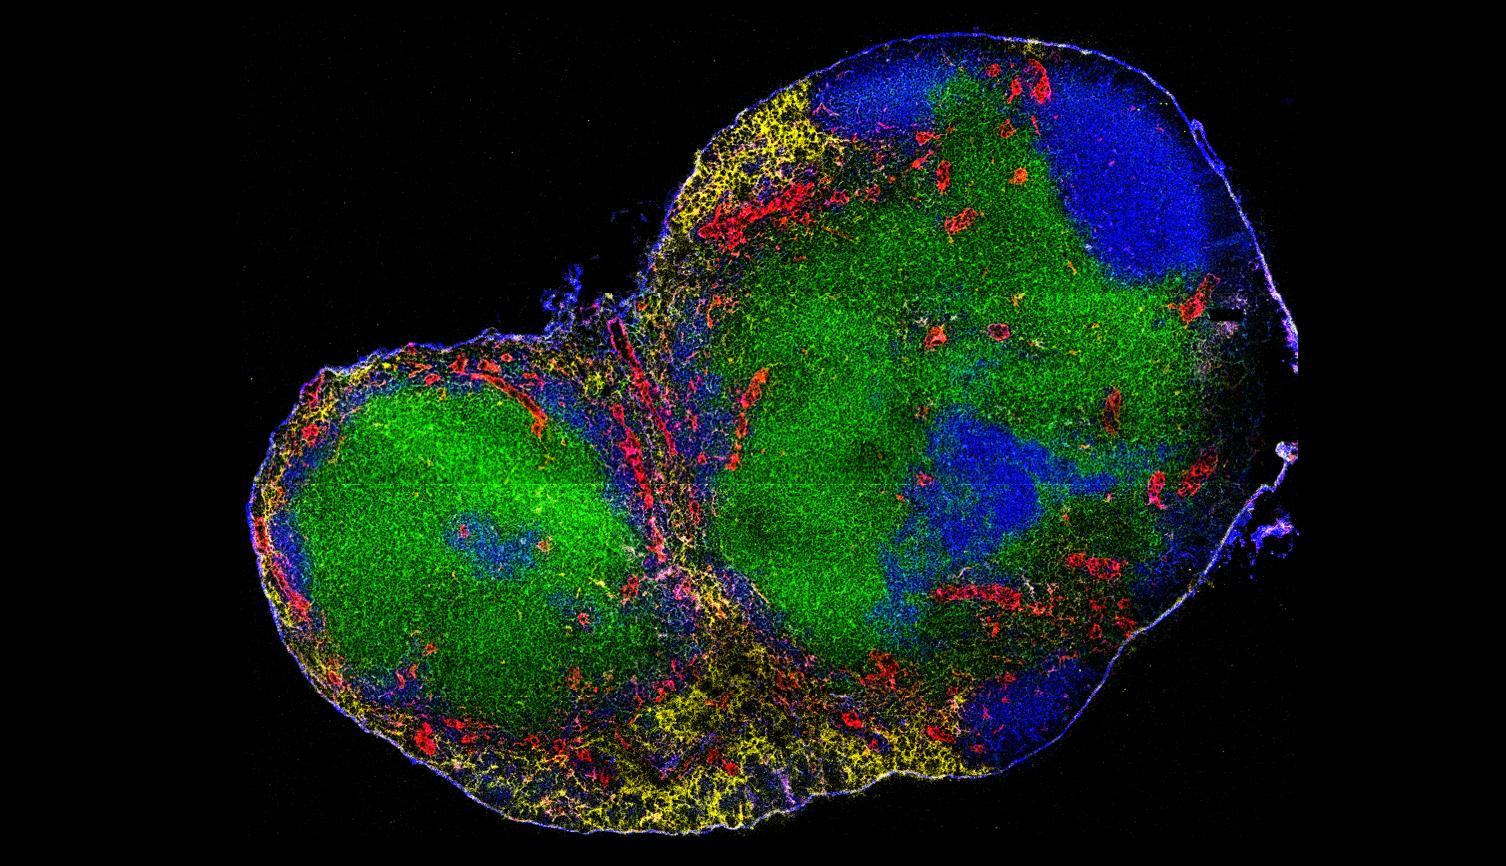 Mouse lymph node (sample provided by Benita Tse and Scott Byrne)